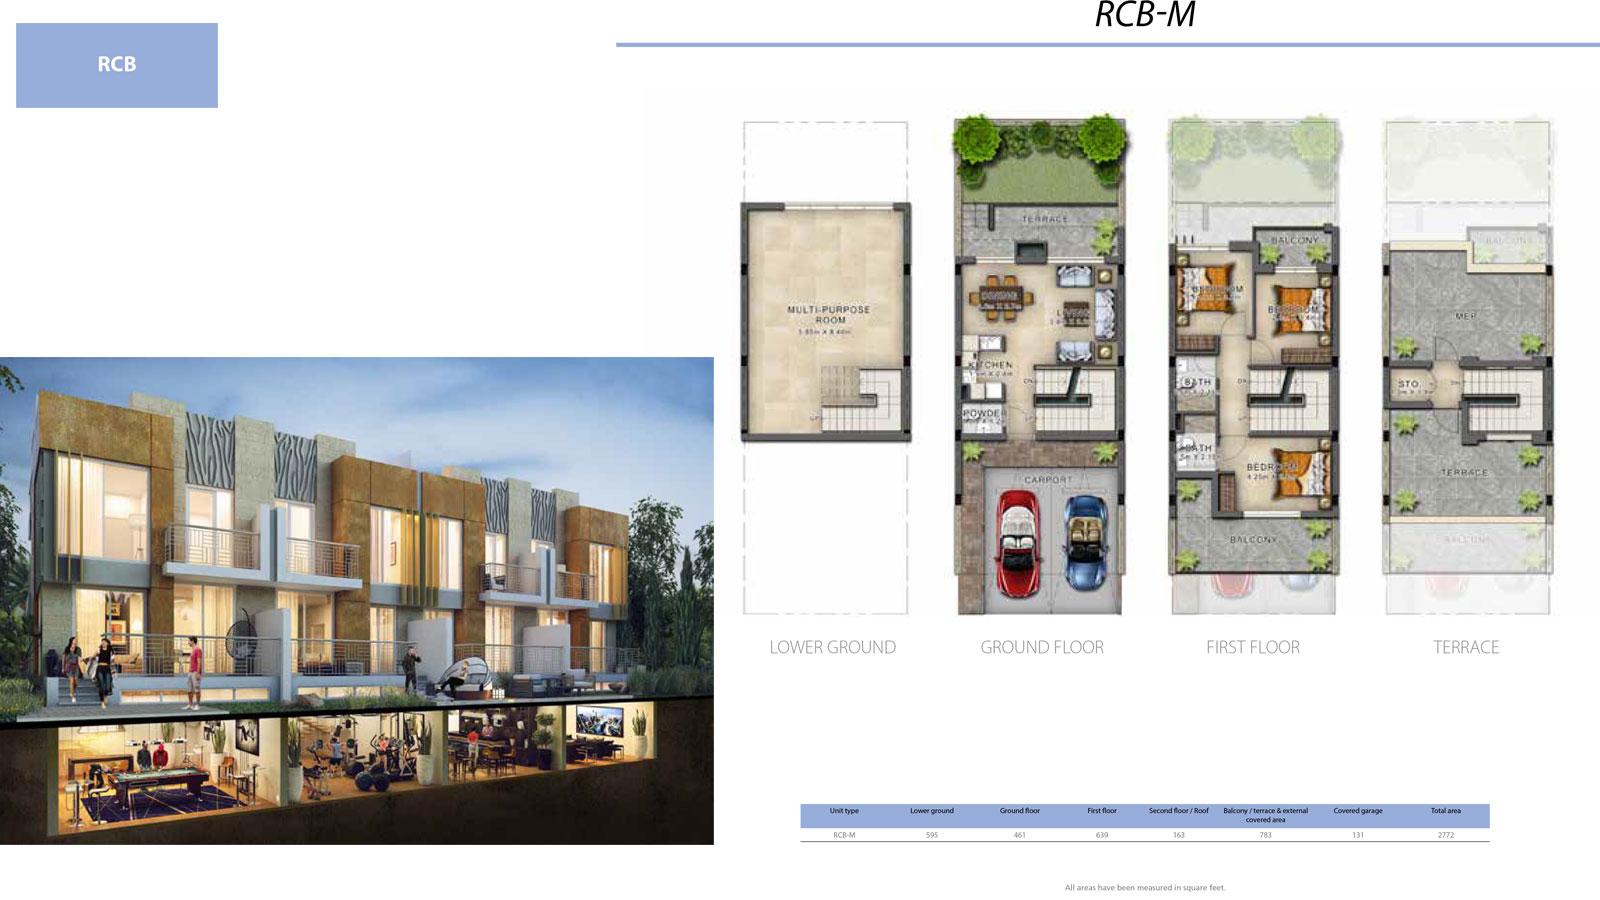 3 BR RCB       (RCB-M, 3 Bedroom Villa, Size 2772 sq ft)